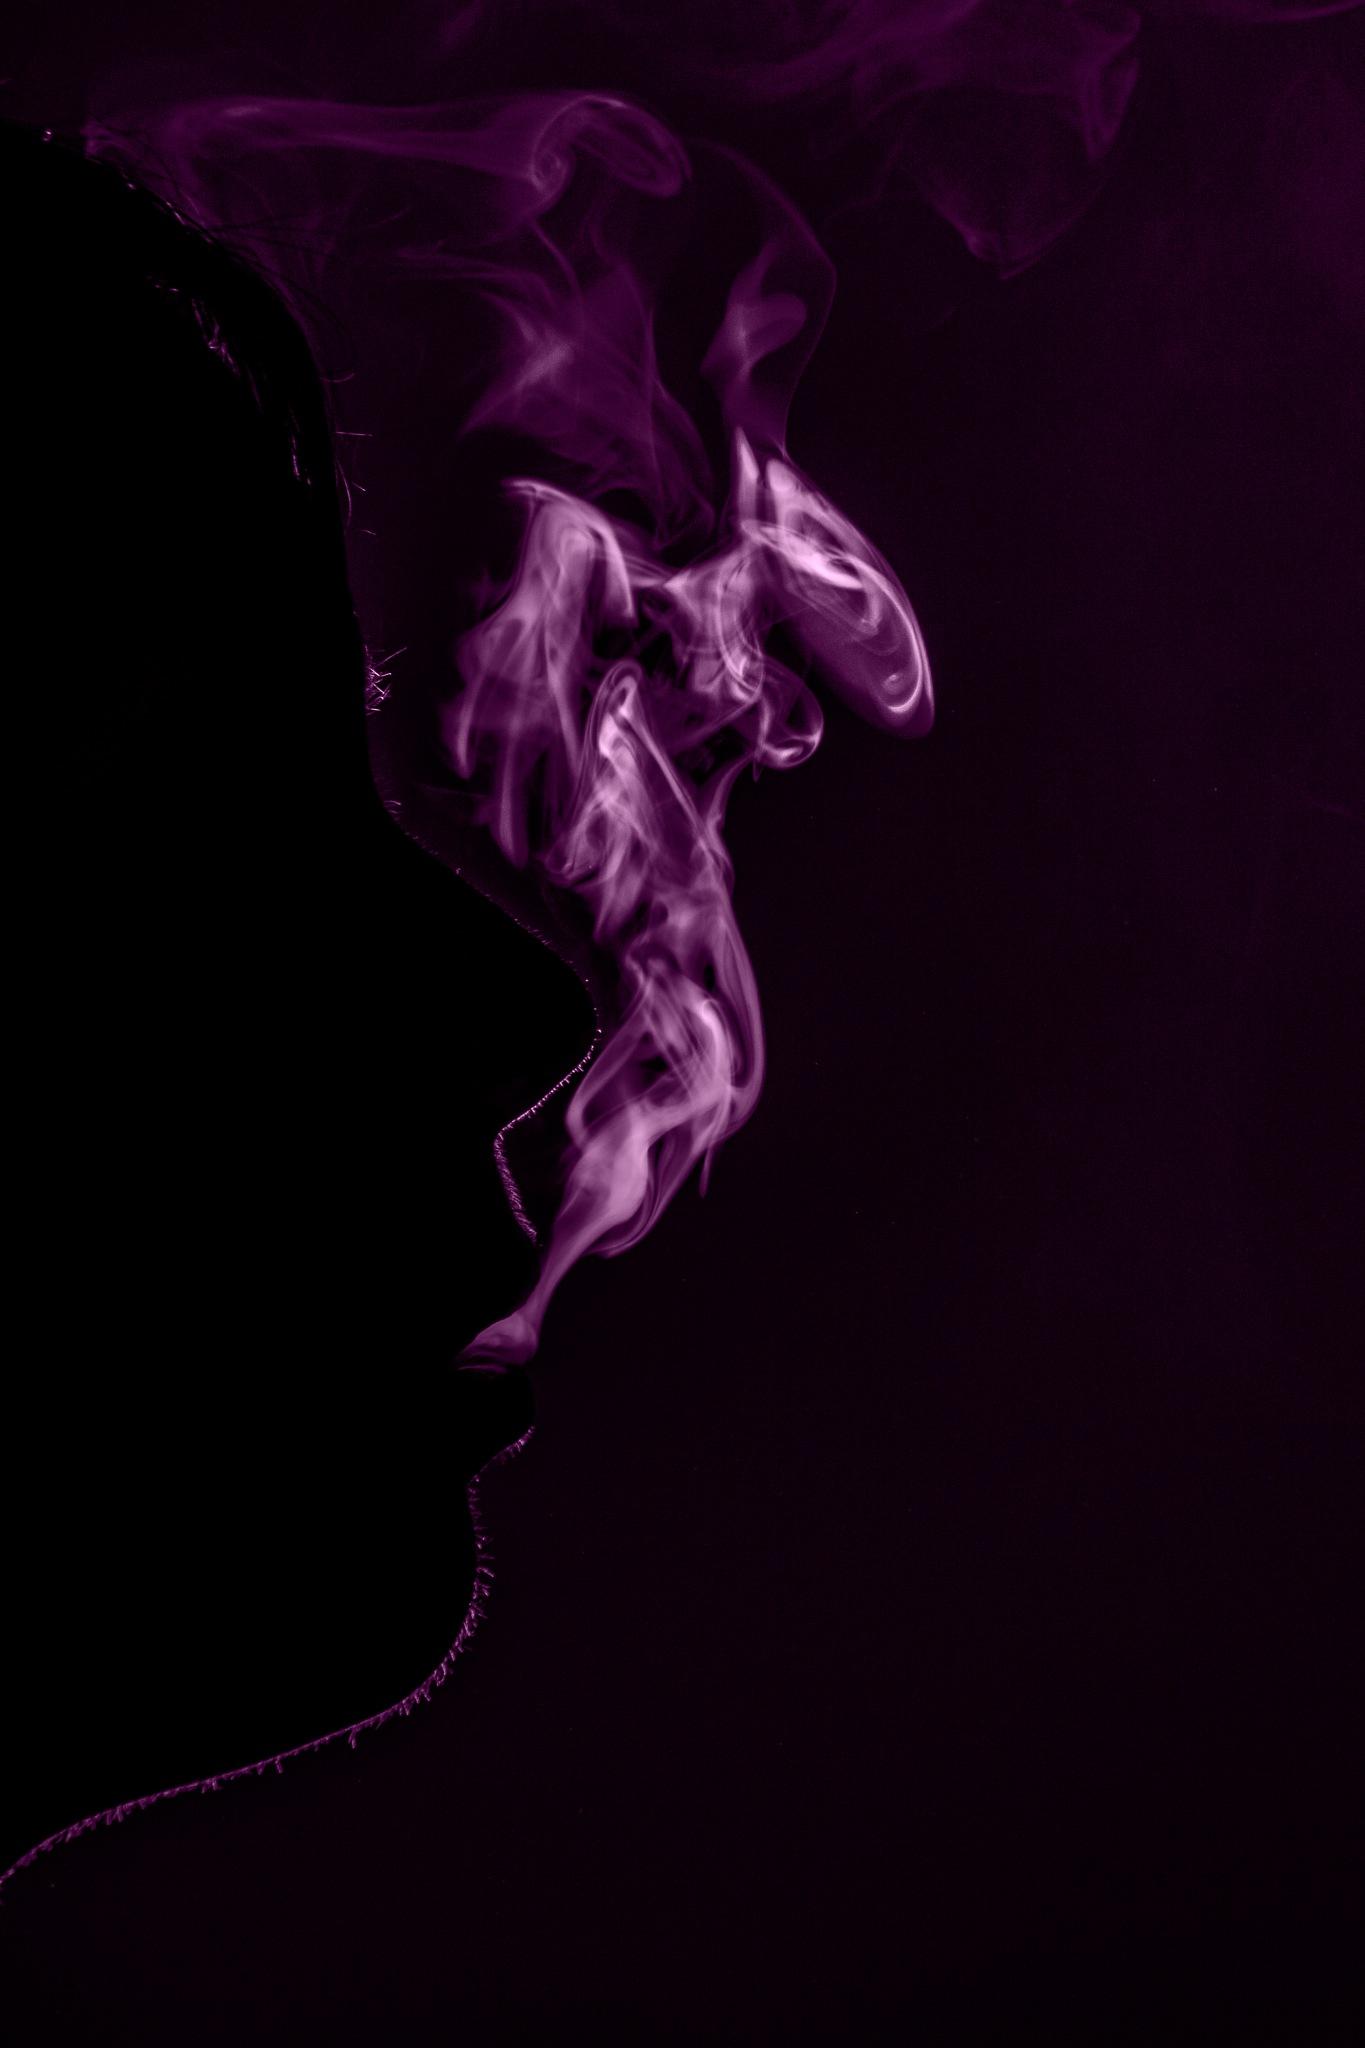 Smokedragon by Patrik Kjellberg